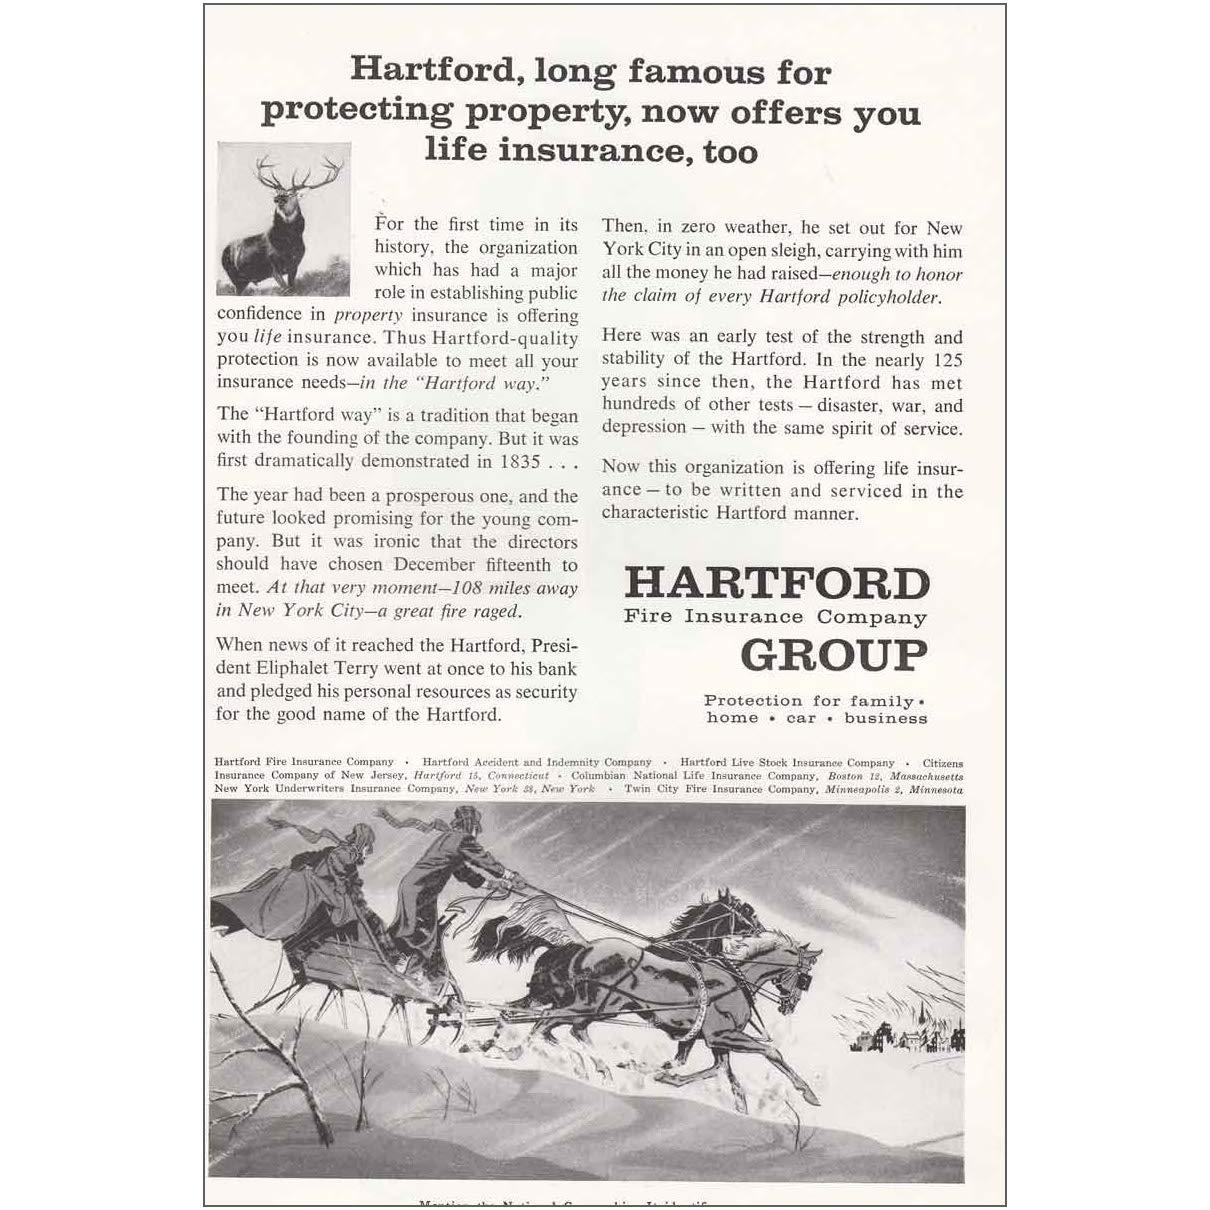 Hartford Life Insurance Customer Service